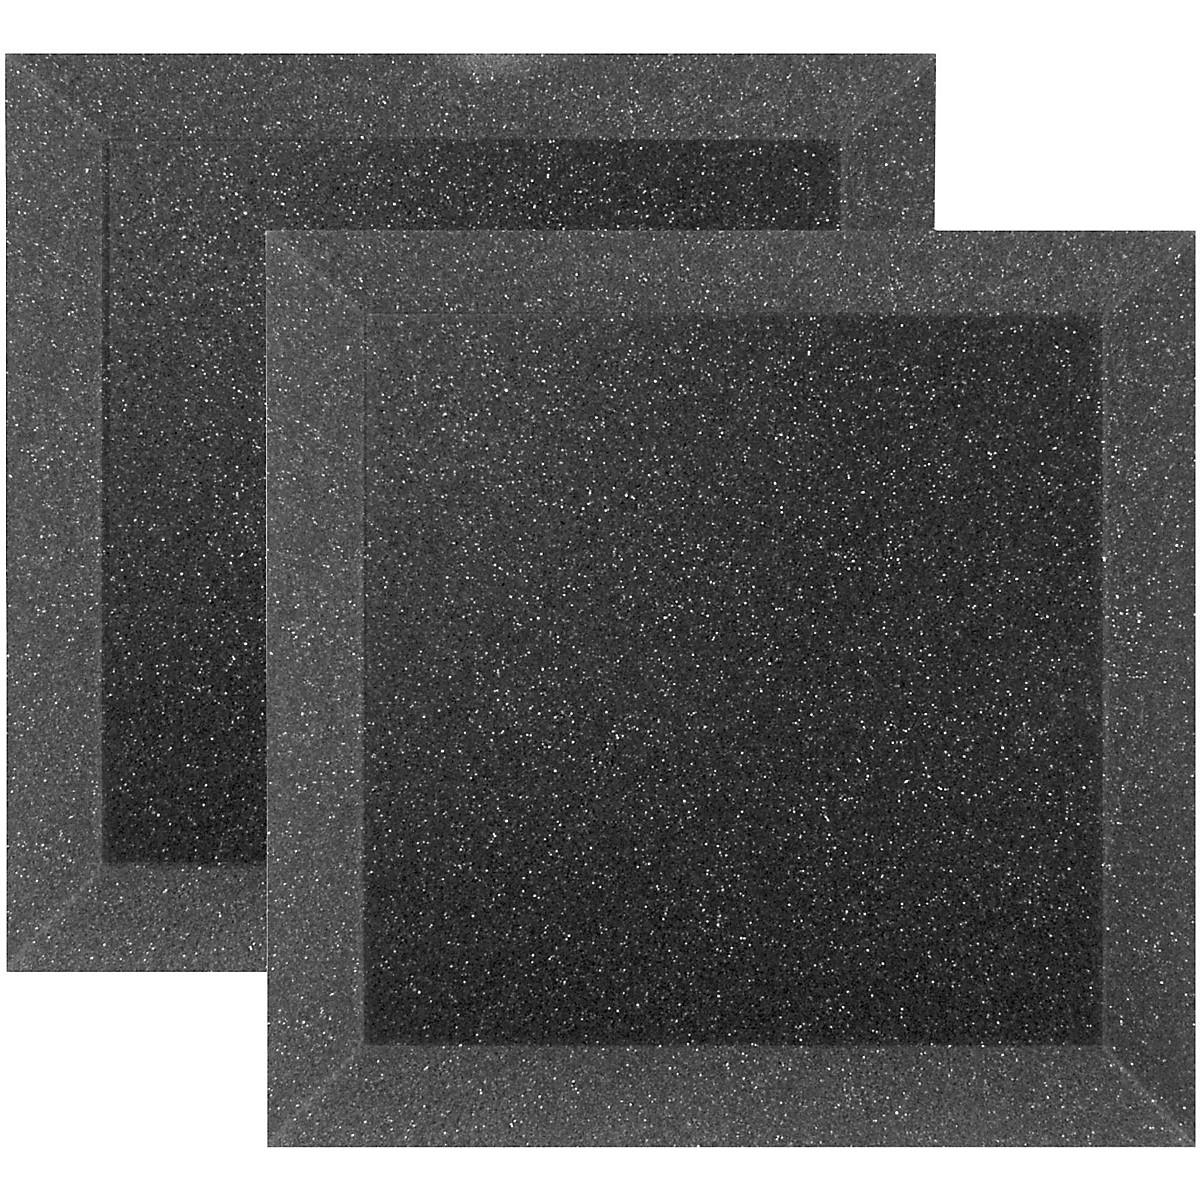 Ultimate Acoustics Acoustic Panel - Bevel 2-Pack